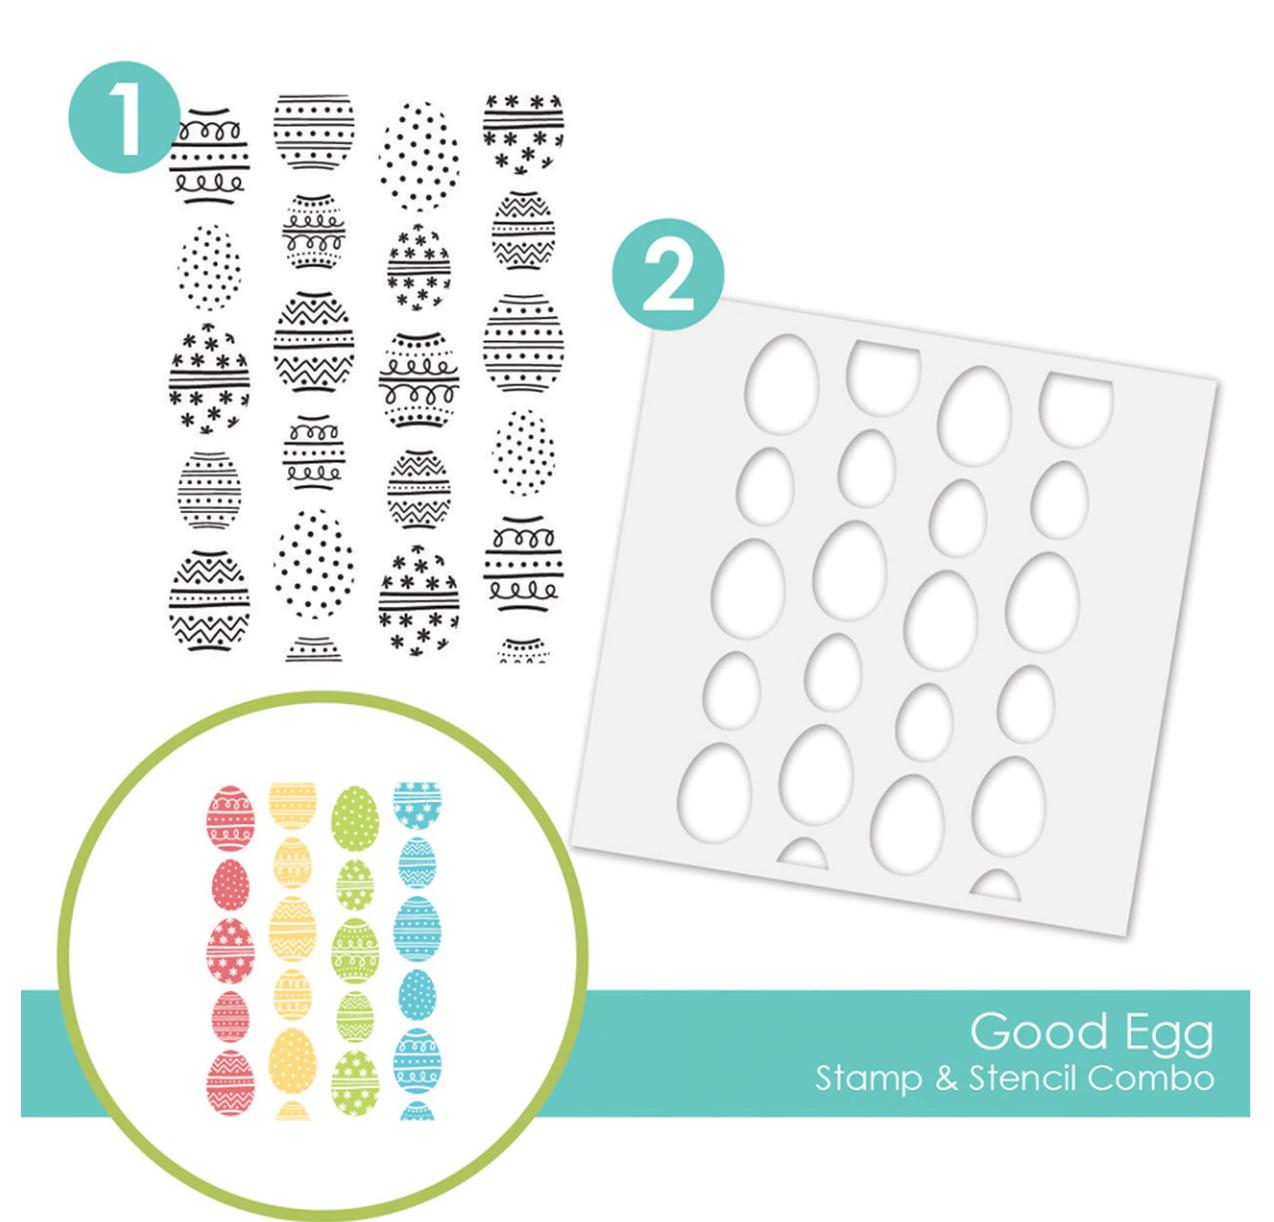 TE Good Egg Stamp & Stencil Combo